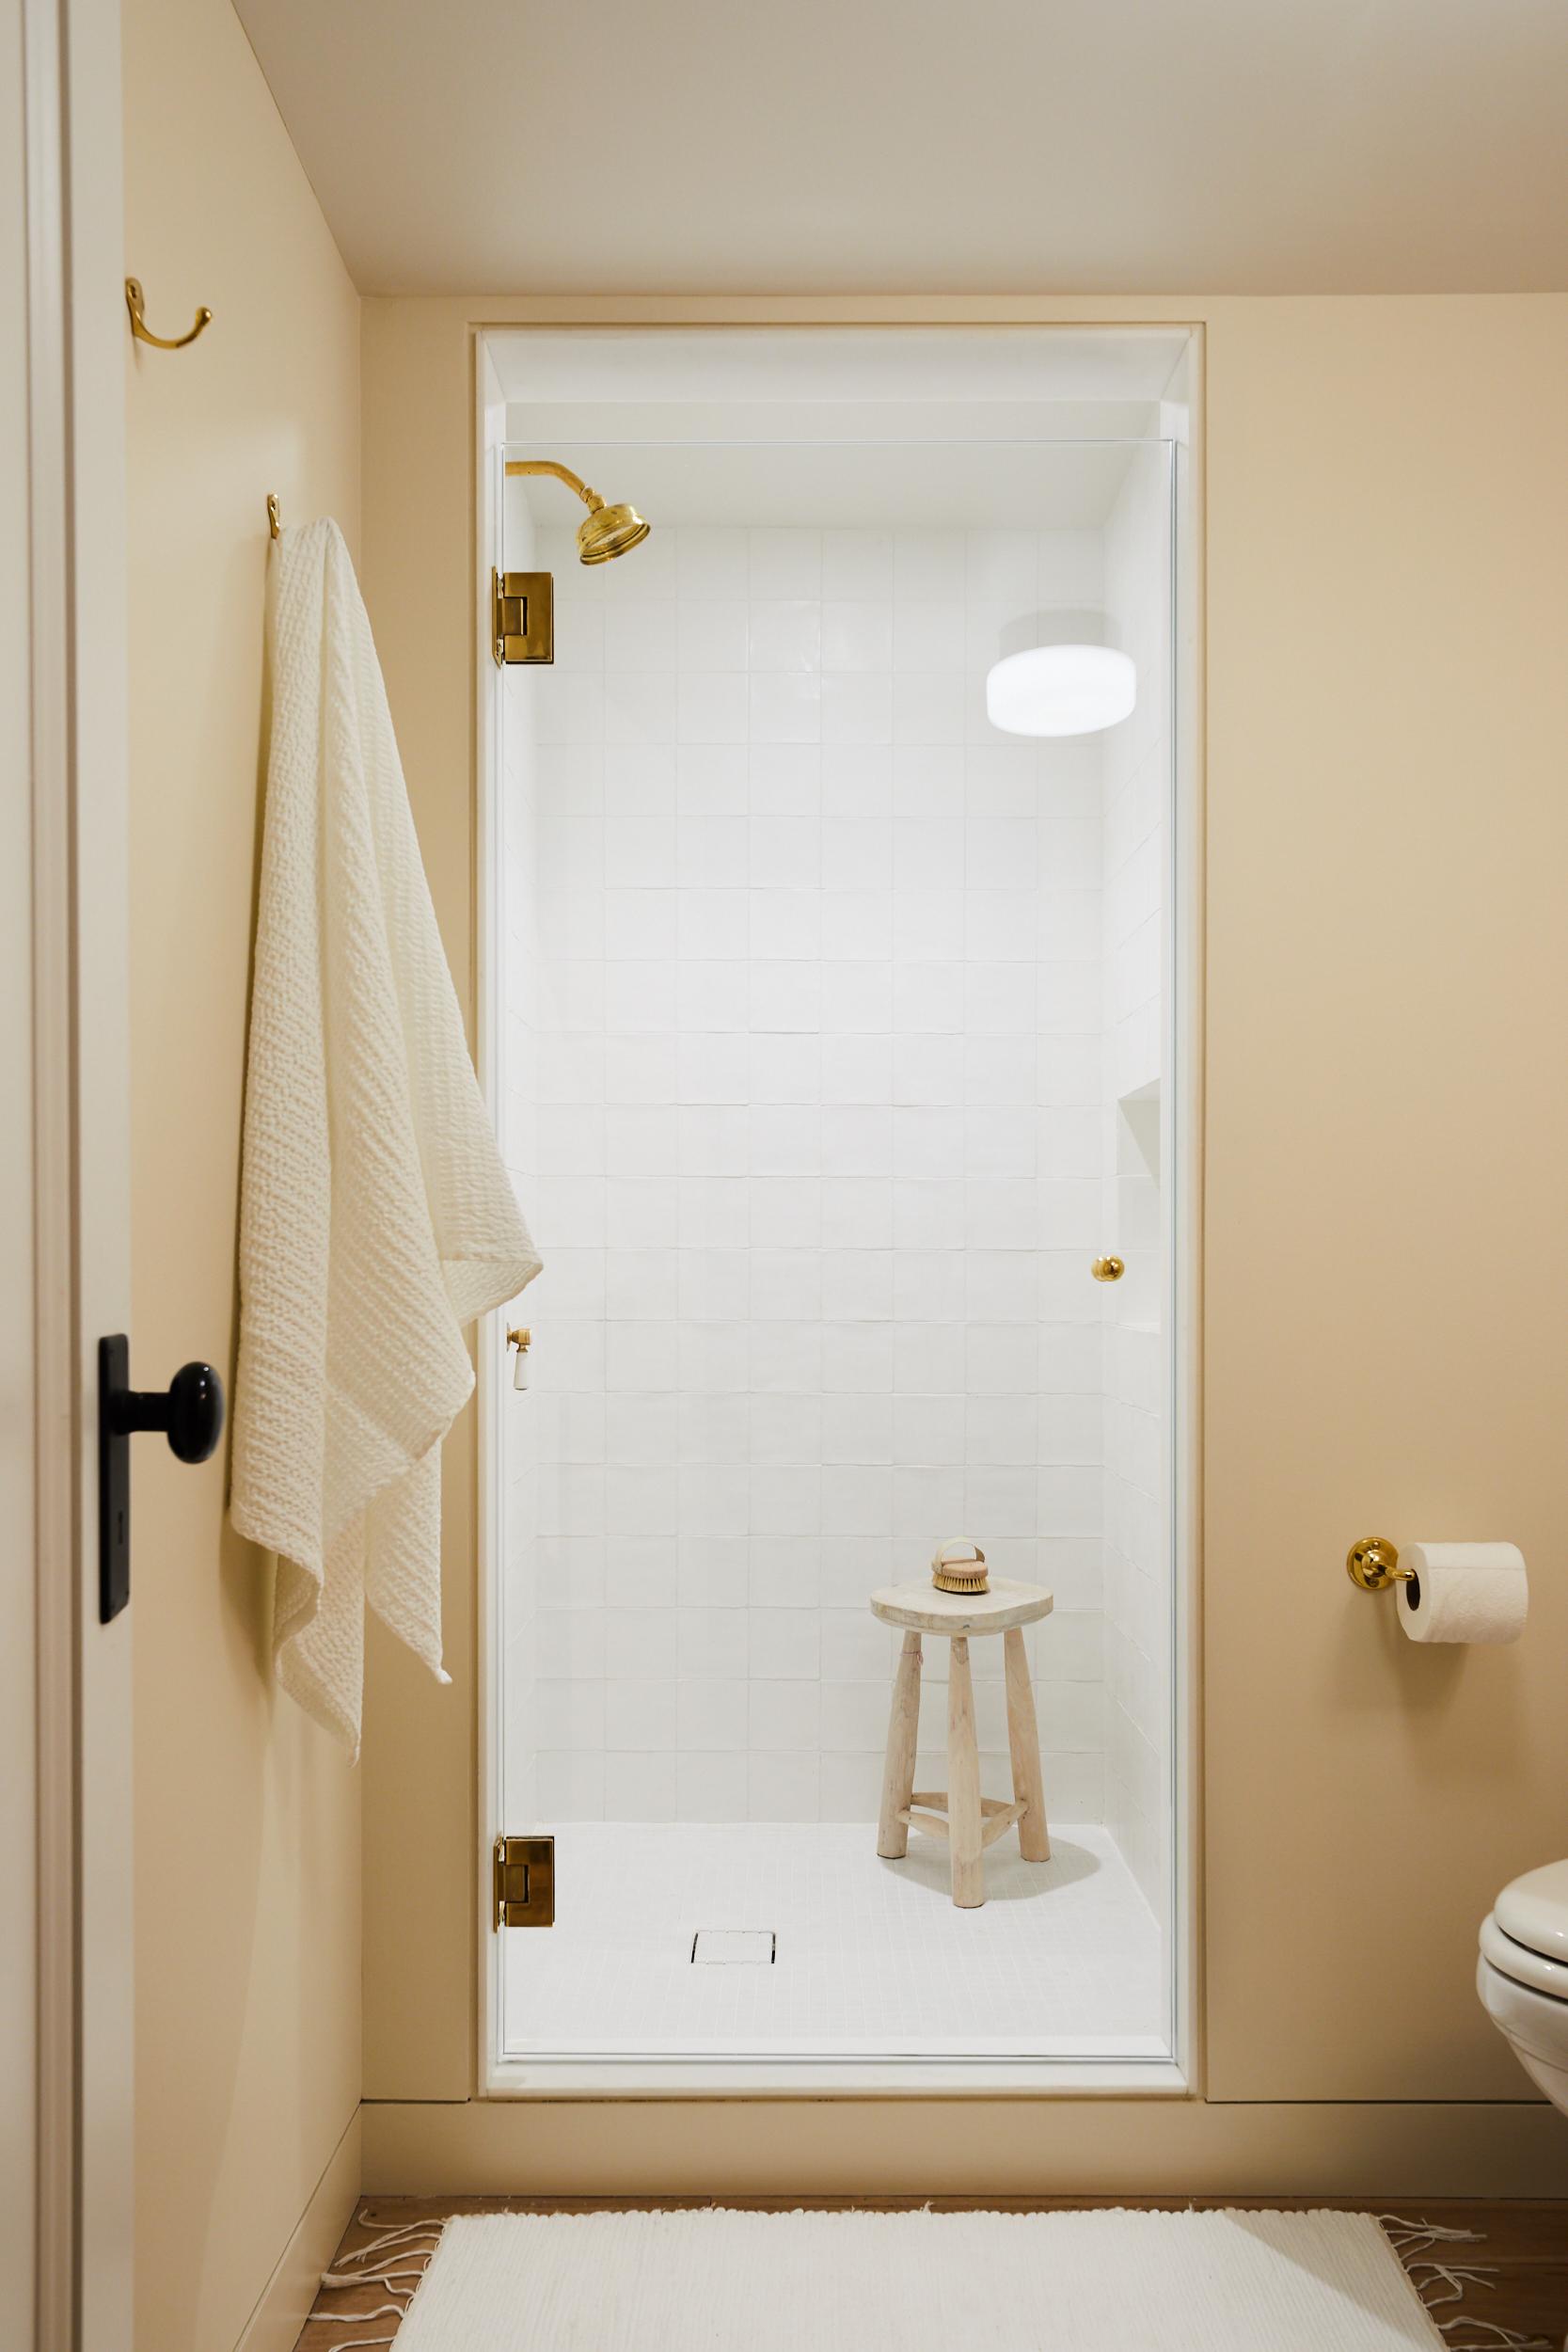 Slope_Townhouse_Bathroom_Ground_Floor_033.jpg